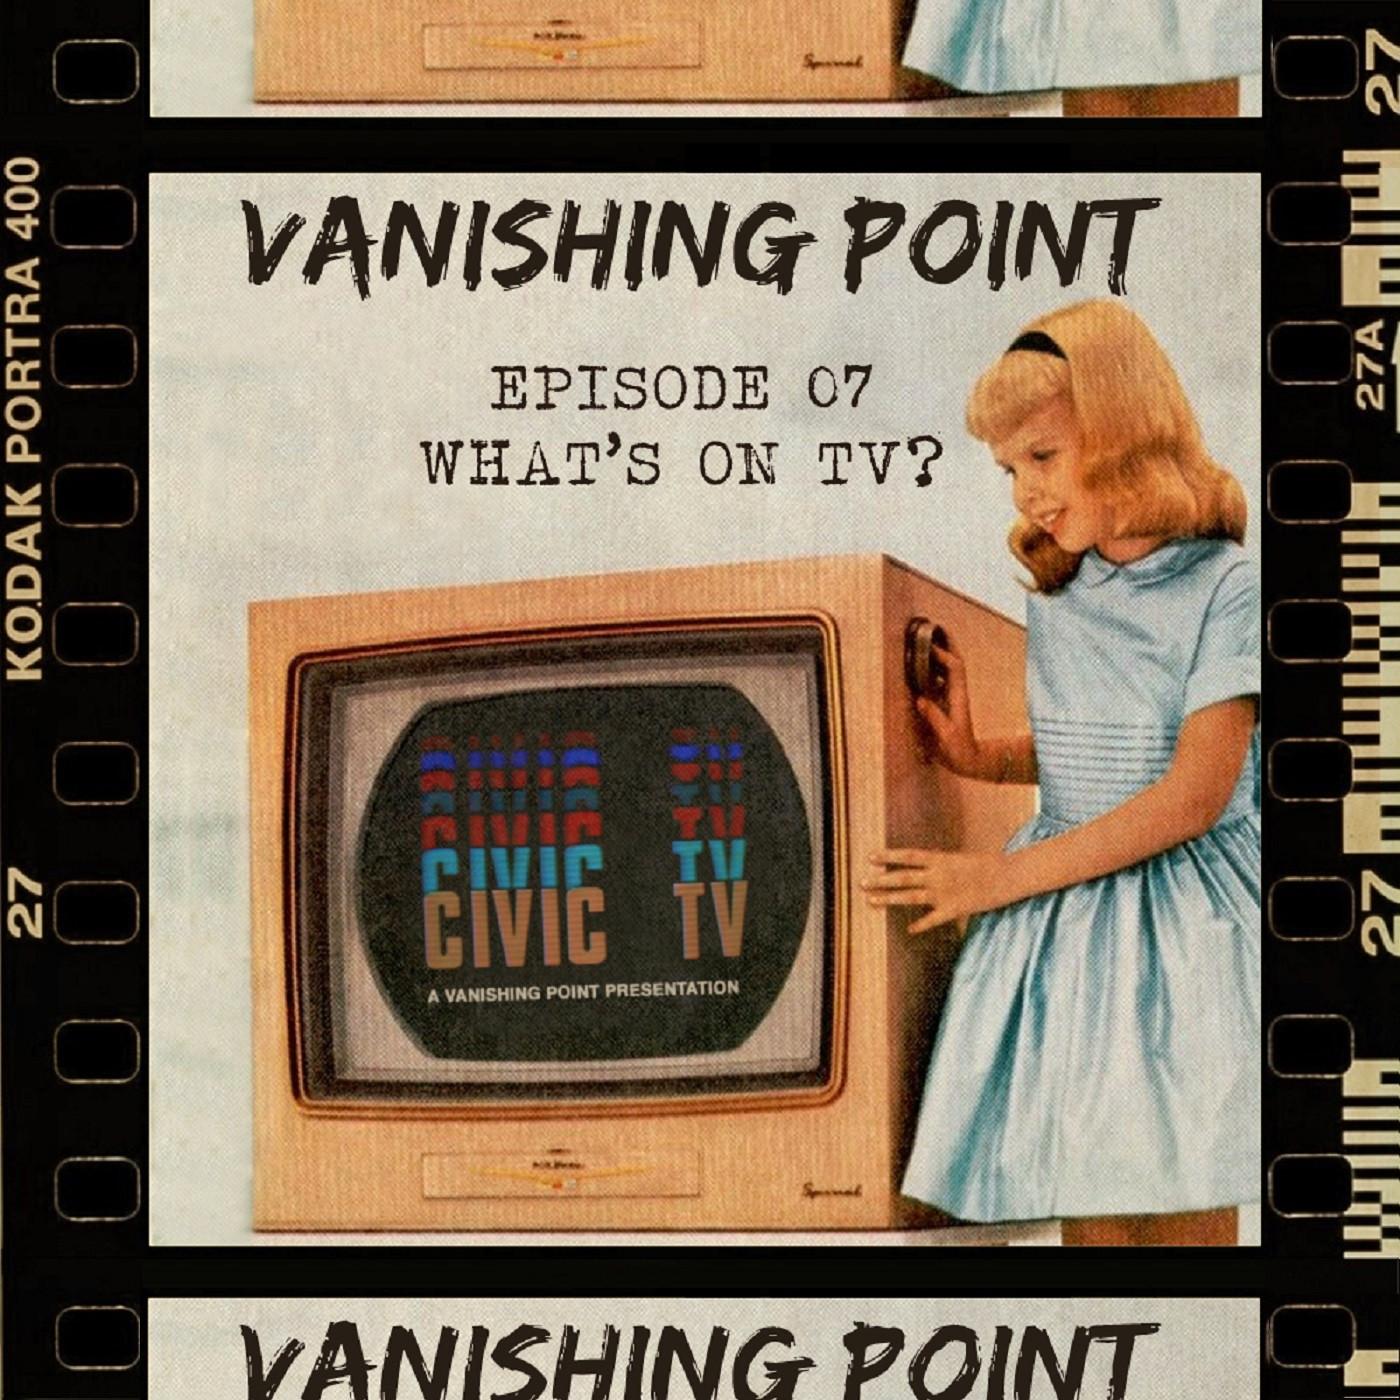 VANISHING POINT #7 - What's on TV ?